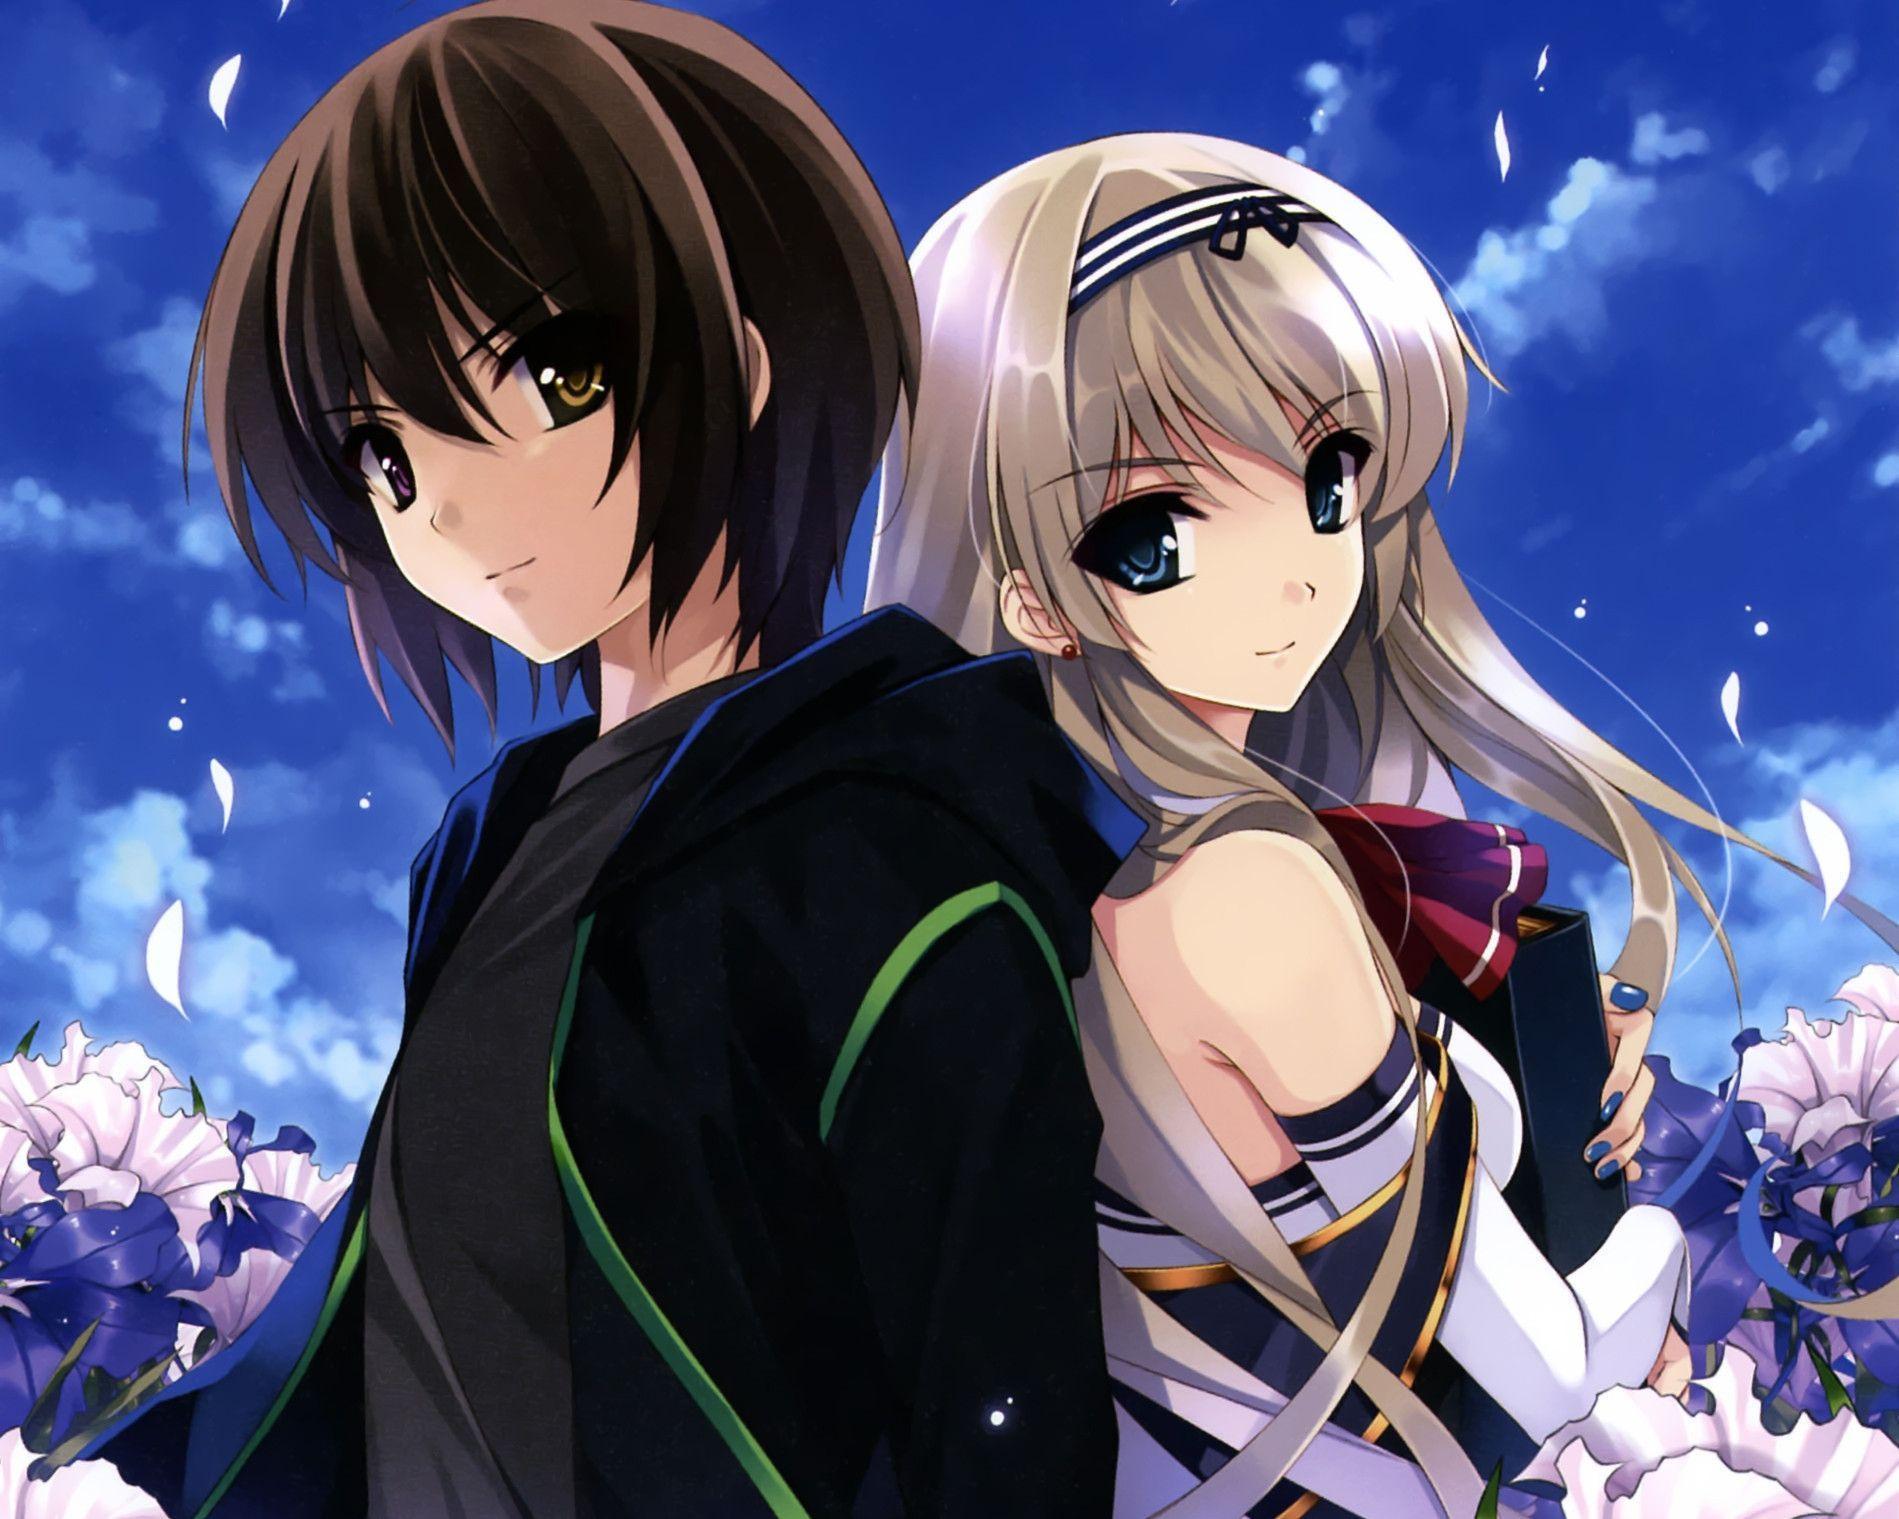 Beautiful Anime Couples Wallpapers Top Free Beautiful Anime